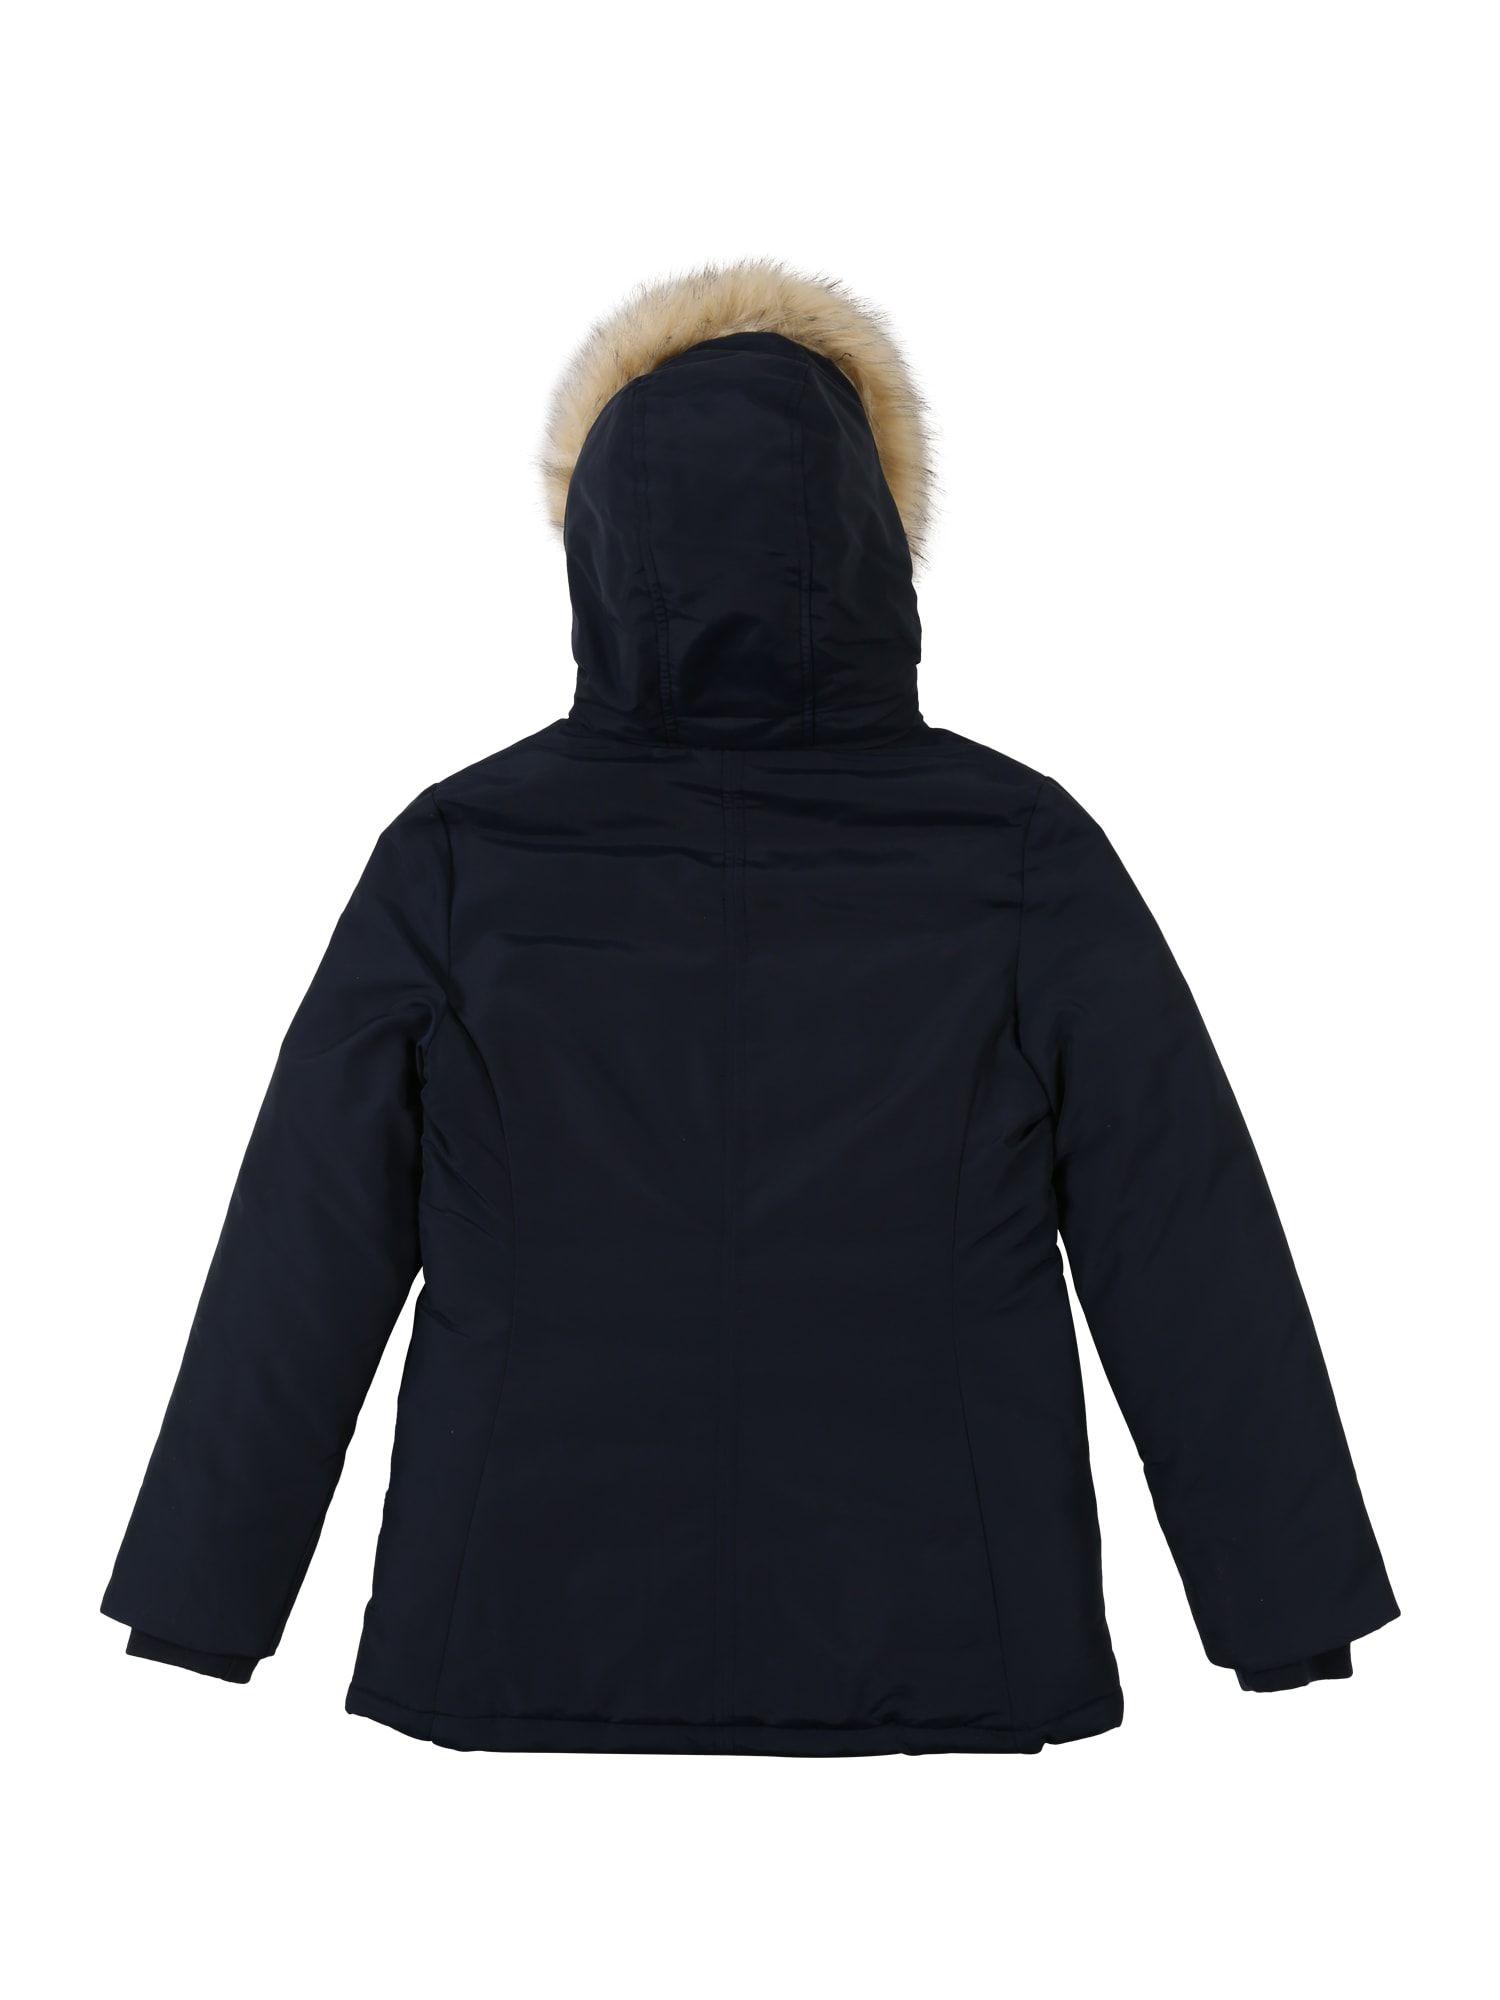 REVIEW FOR TEENS Jacke 'TG 19 J900' Mädchen, Navy, Größe 128